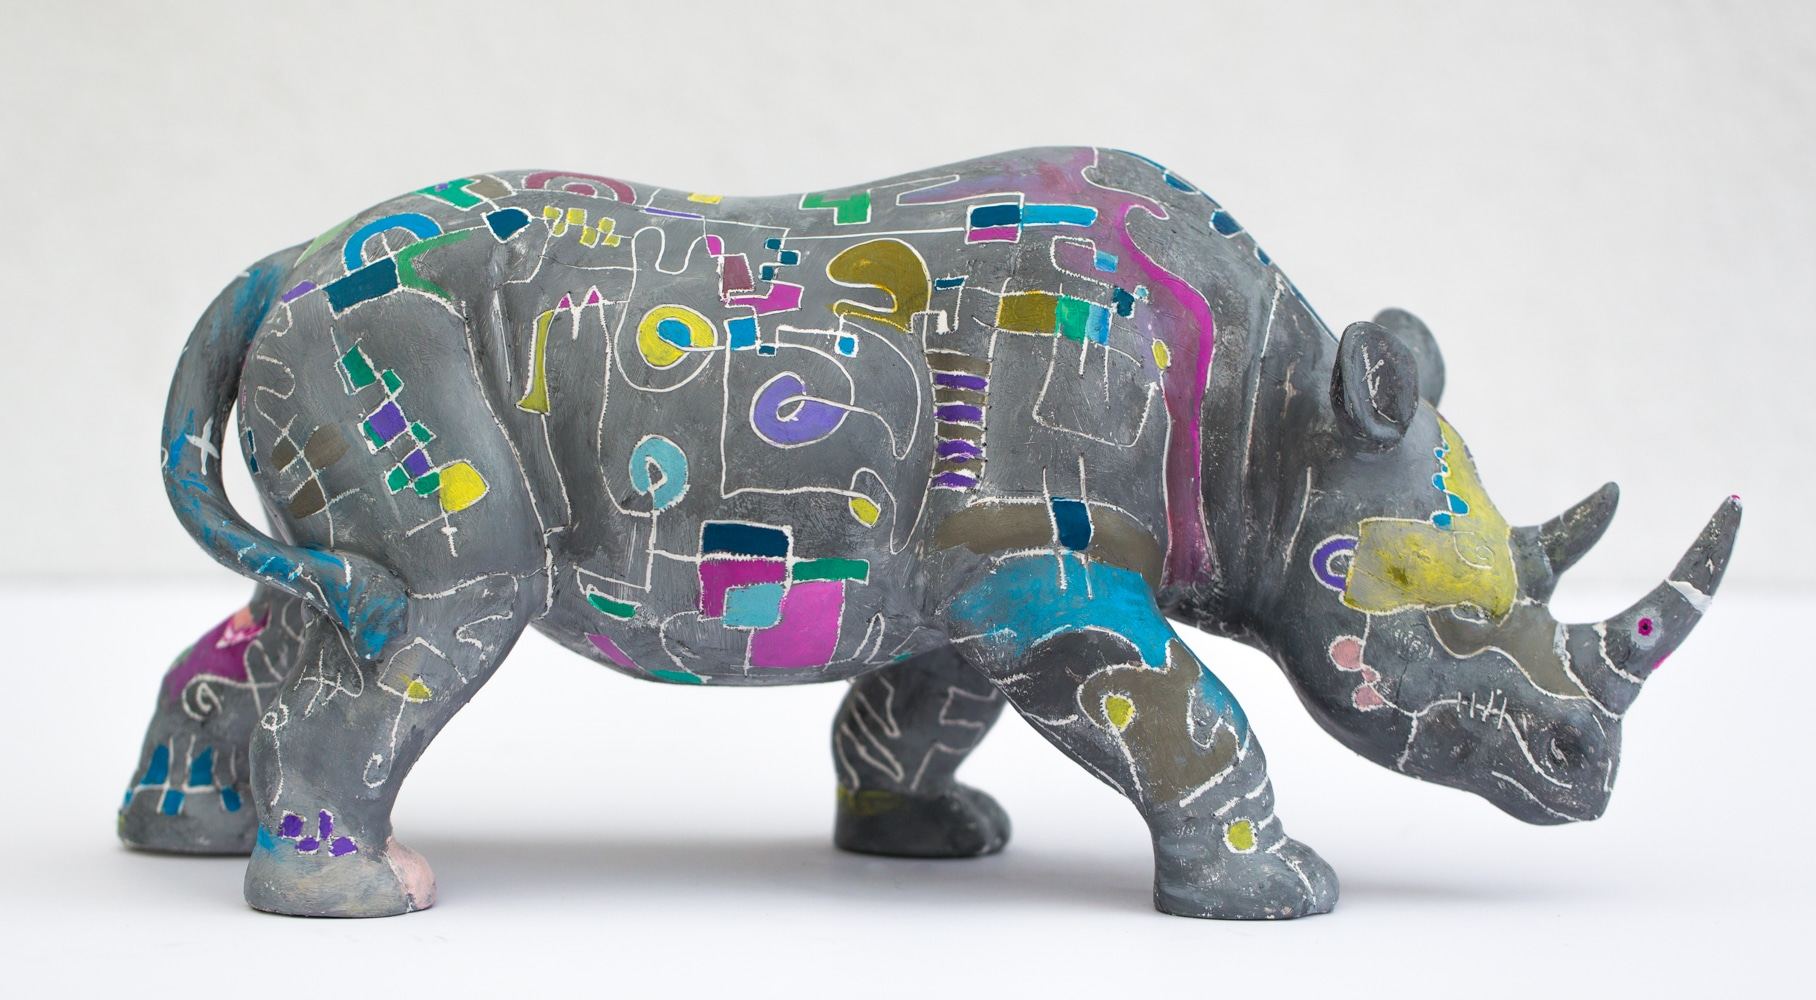 rhino_sculpture_by_gregory_beylerian_2